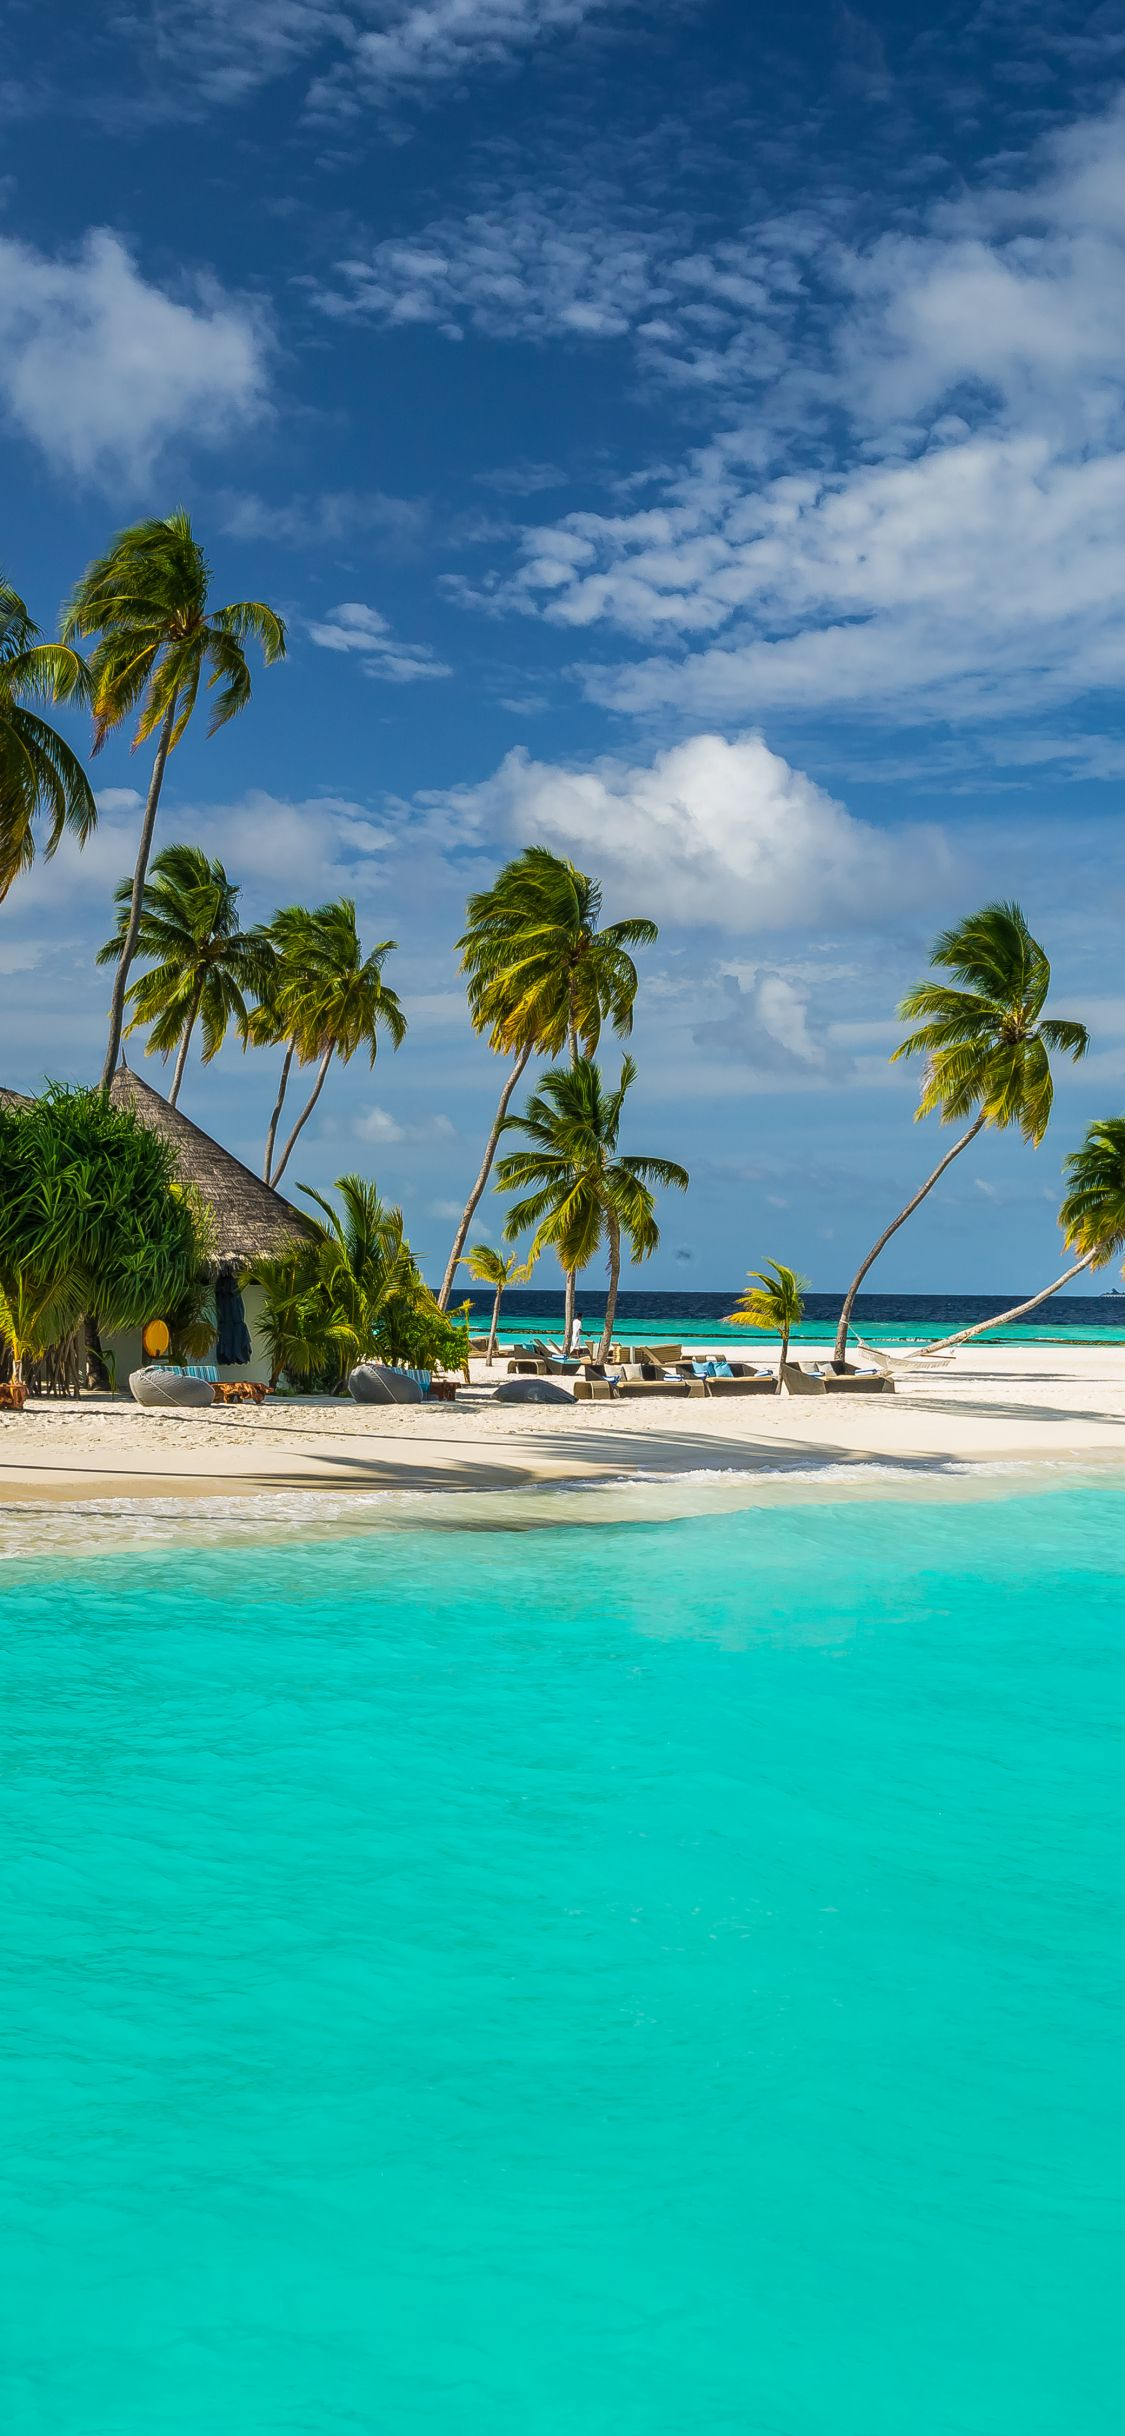 Maldives Seaside Mobile Wallpaper Sea Palm Tree Tropical Resort Maldives Wallpaper Beautiful Beaches Beautiful Places To Travel Beach mobile wallpaper hd sea images